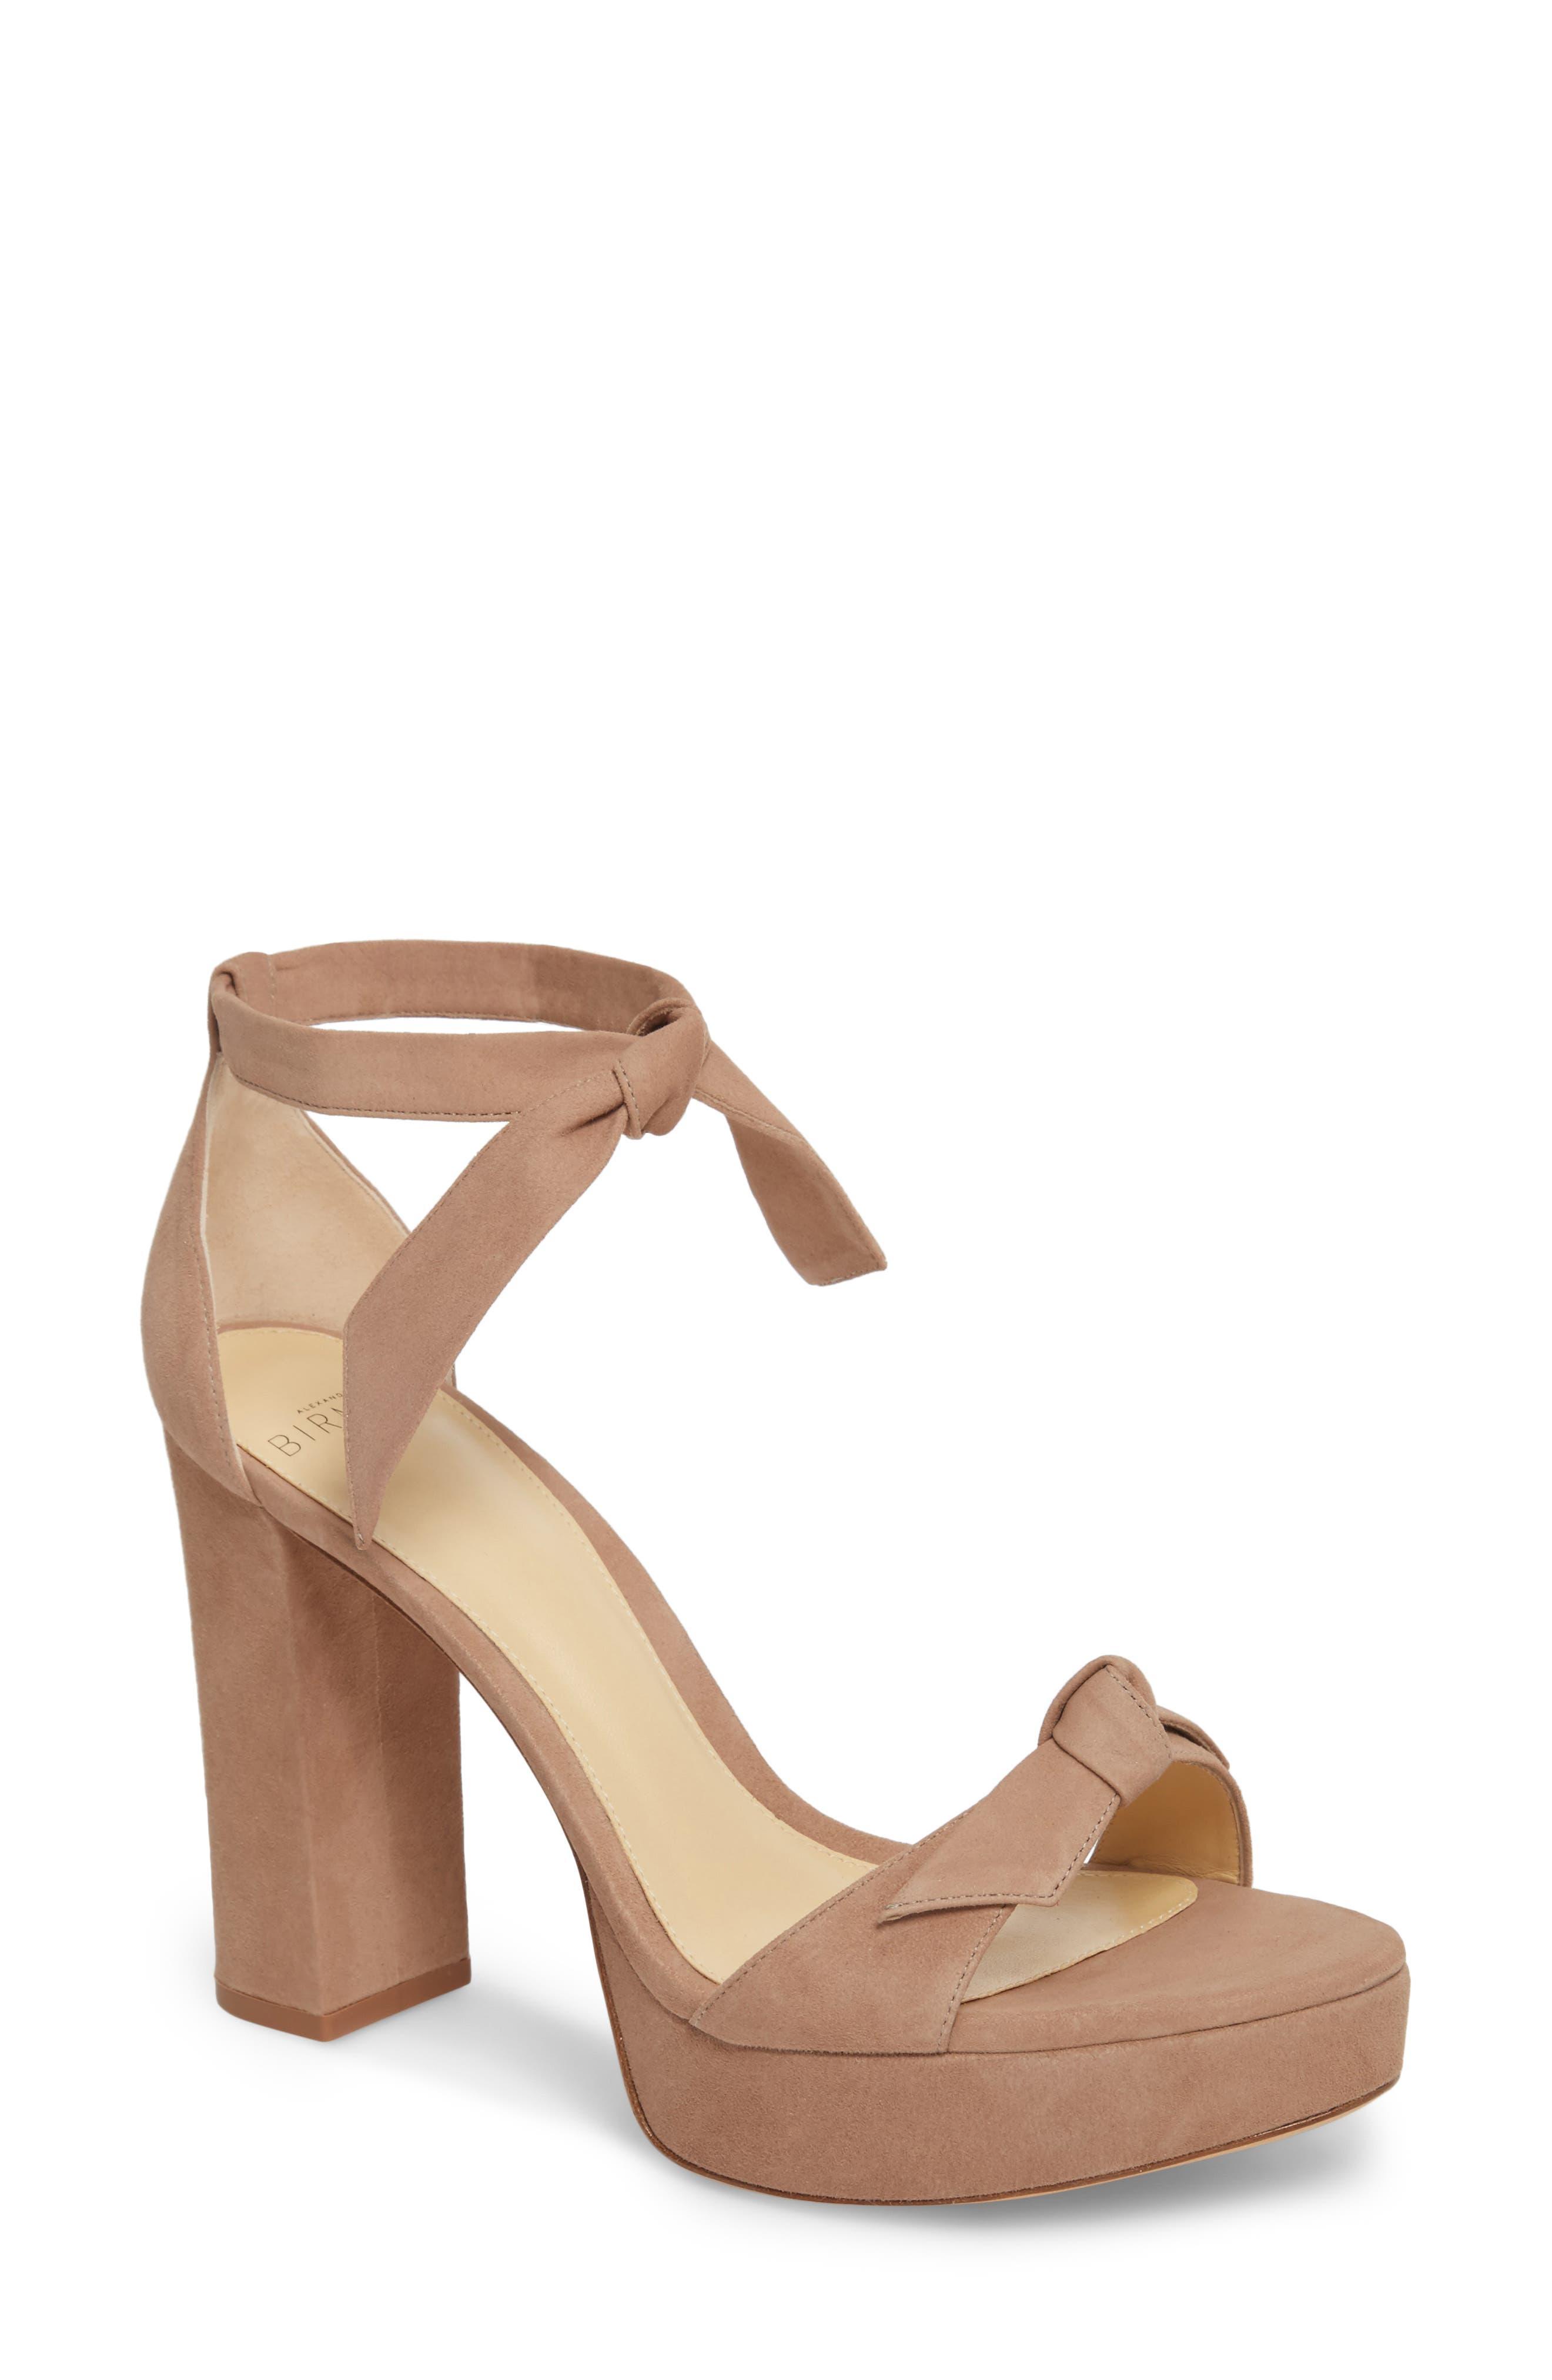 Alternate Image 1 Selected - Alexandre Birman Mabeleh Platform Sandal (Women)